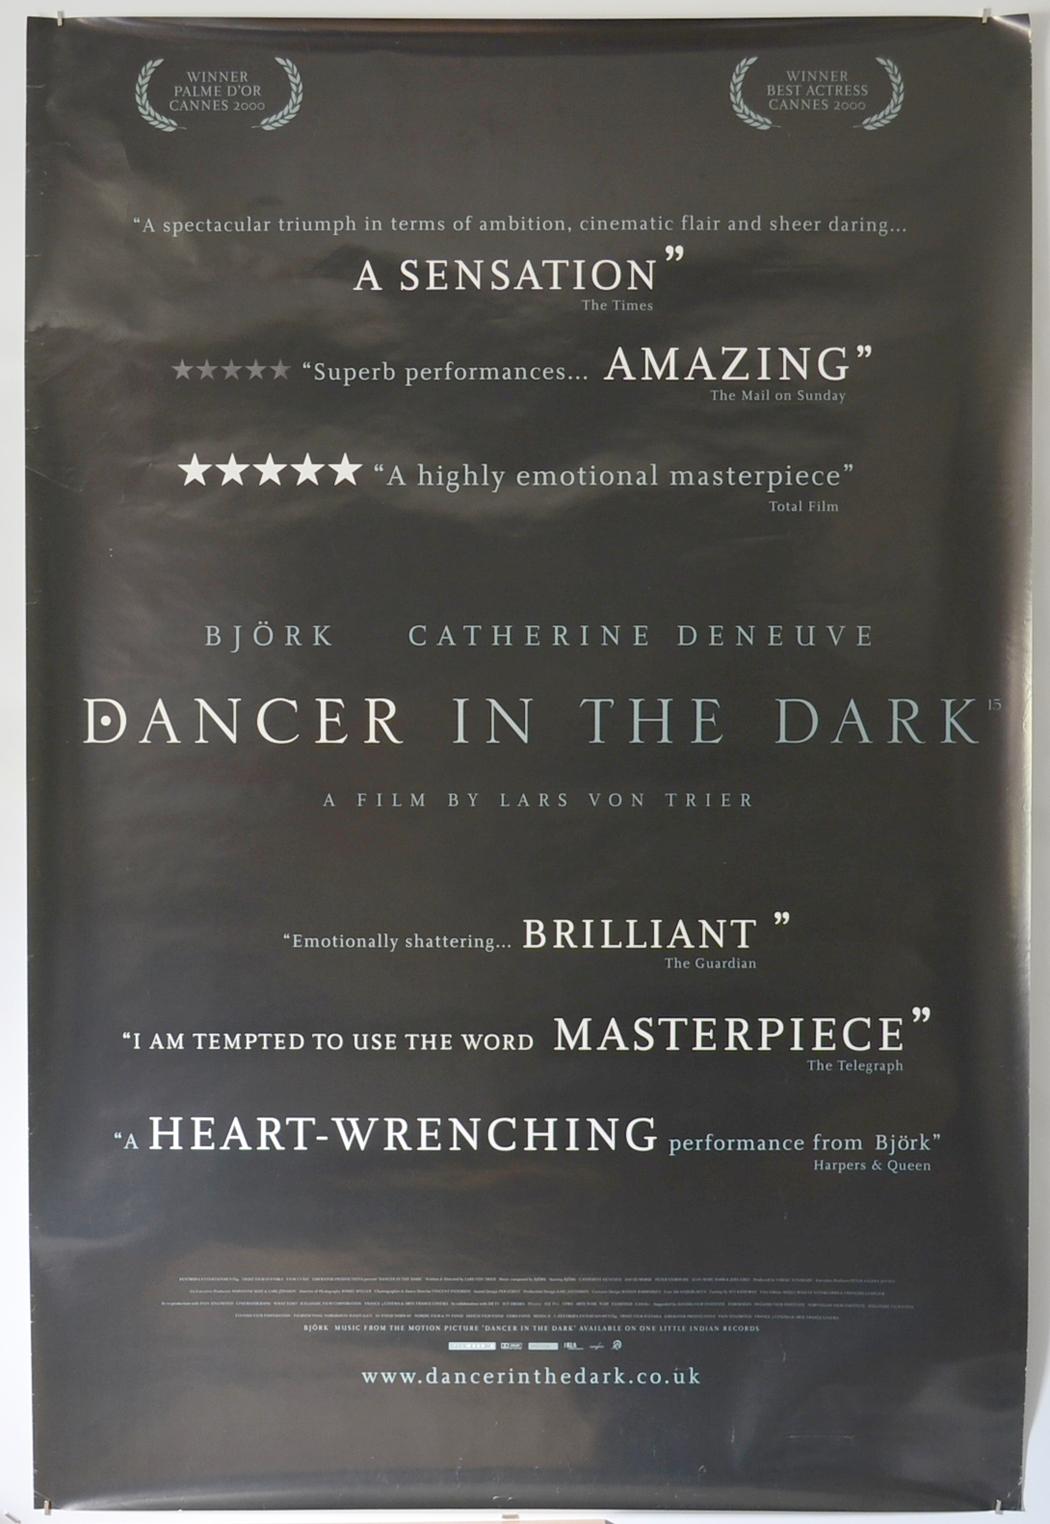 Dancer In The Dark P I British 4 Sheet Poster I P Original Cinema Movie Poster From Pastposters Com British Quad Posters And Us 1 Sheet Posters